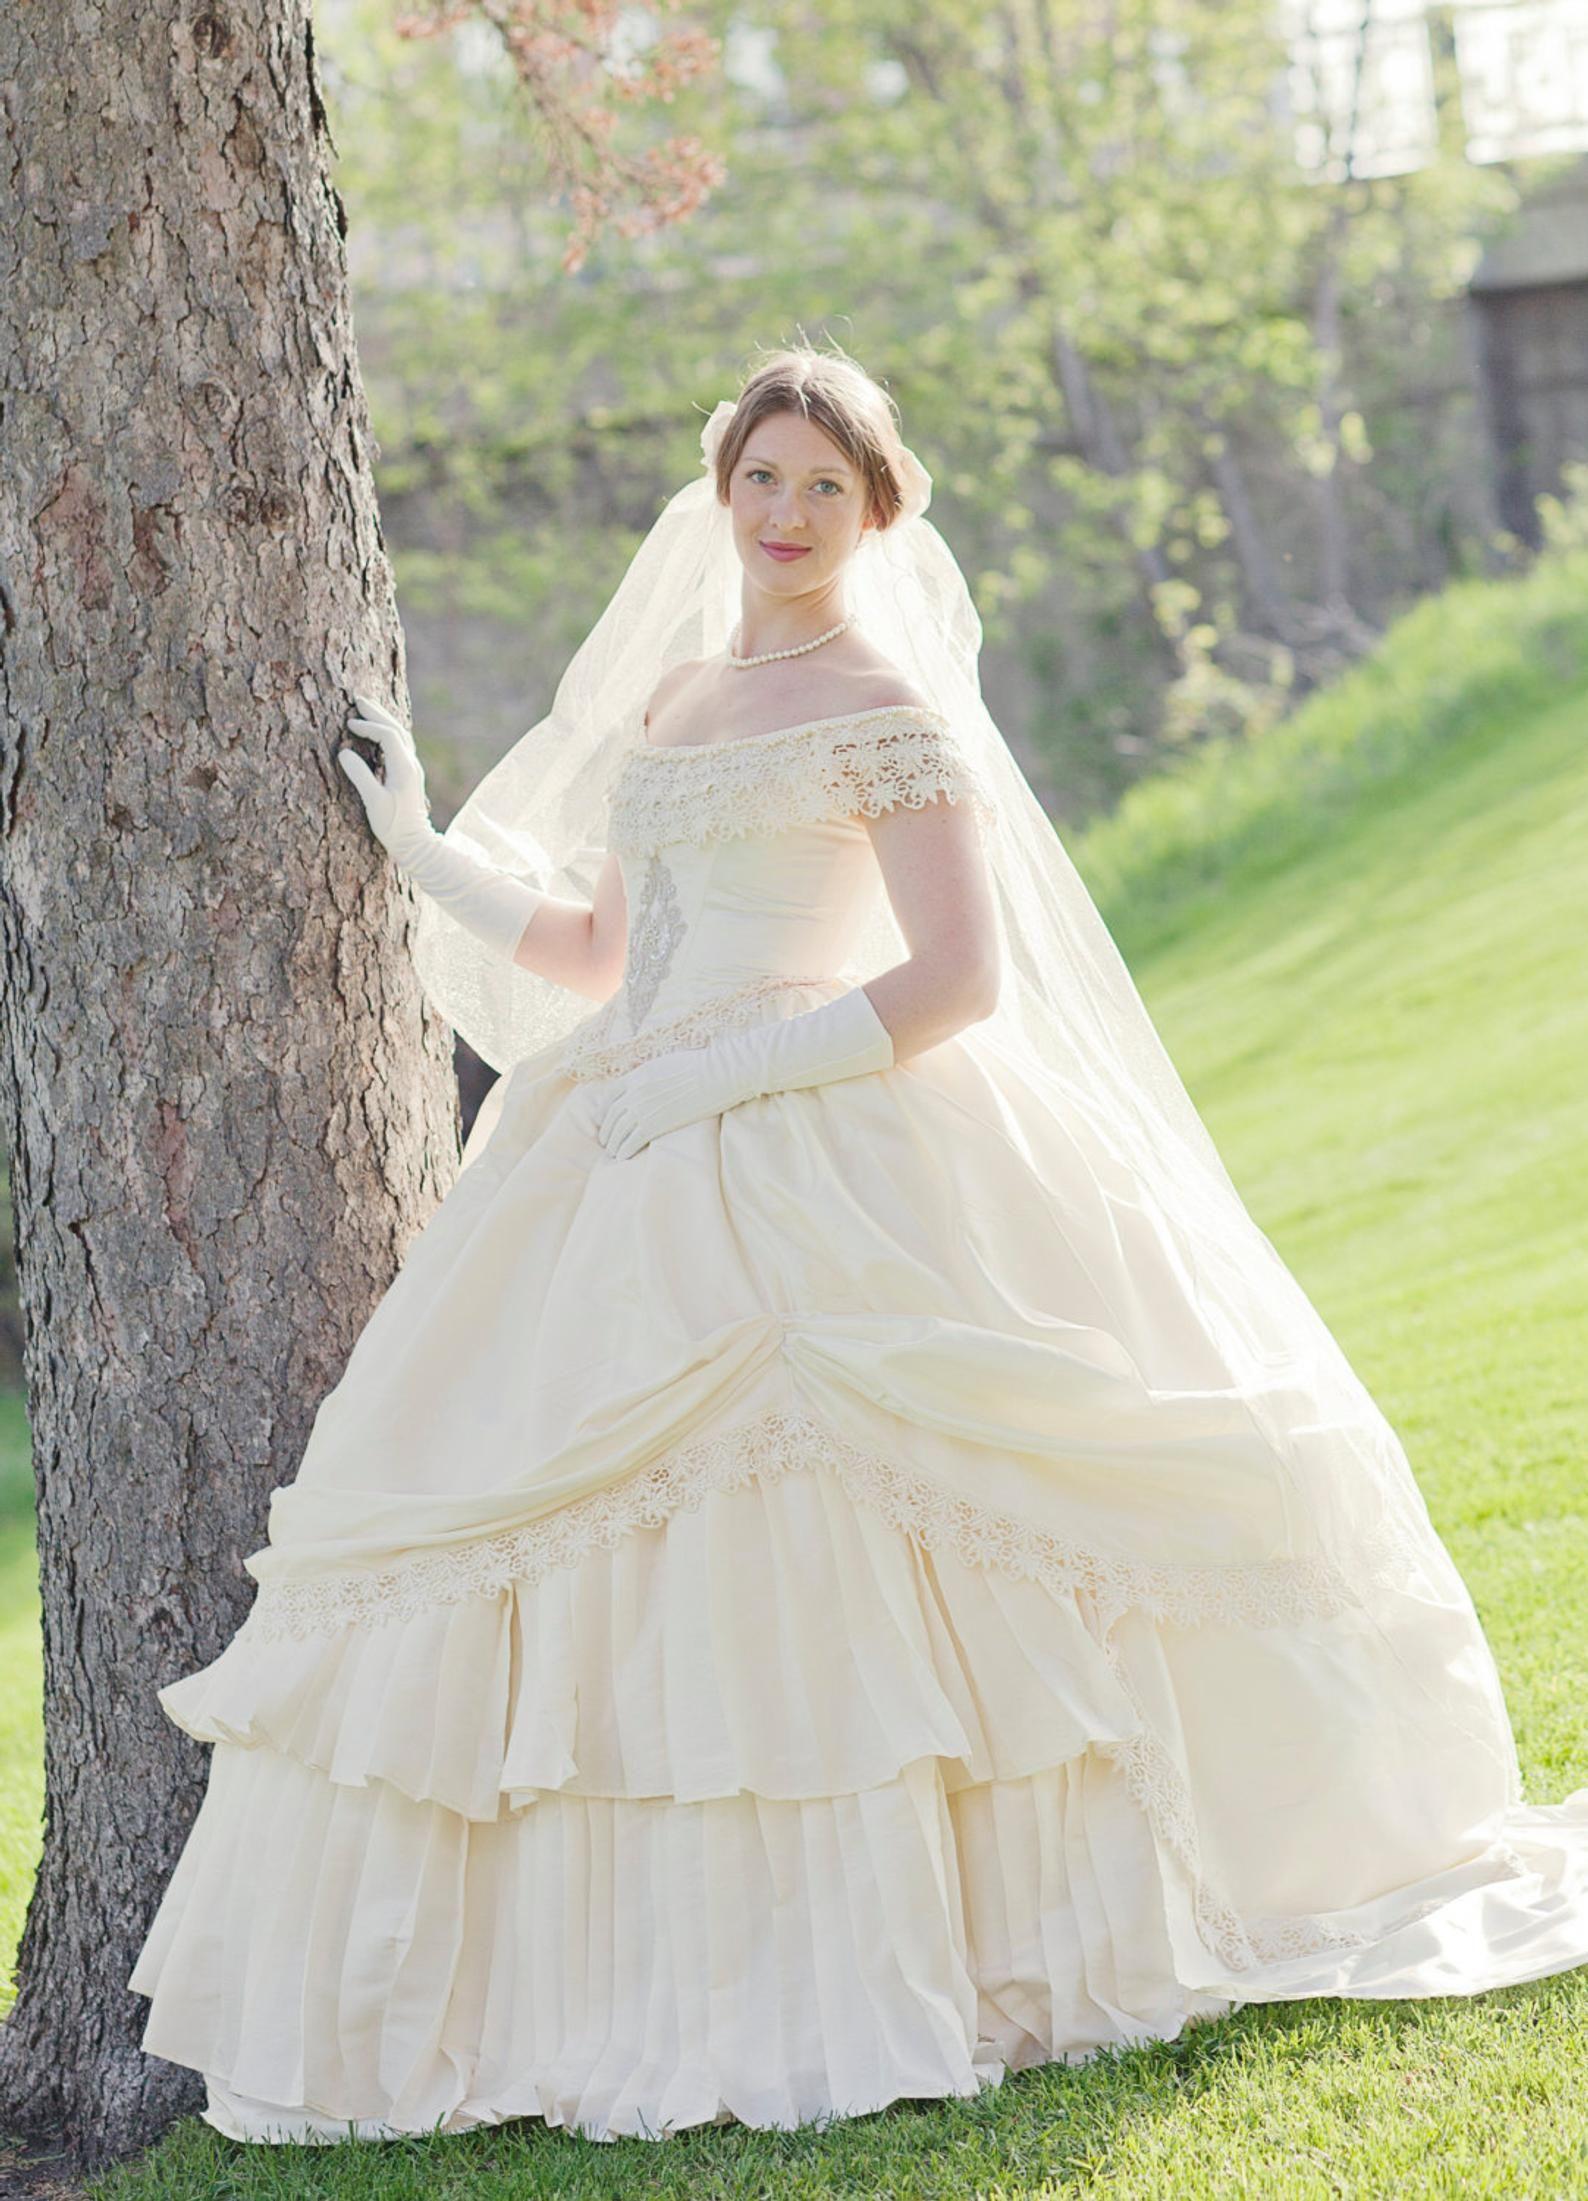 Bridal Wedding Victorian Civil War Steampunk Gown Dress